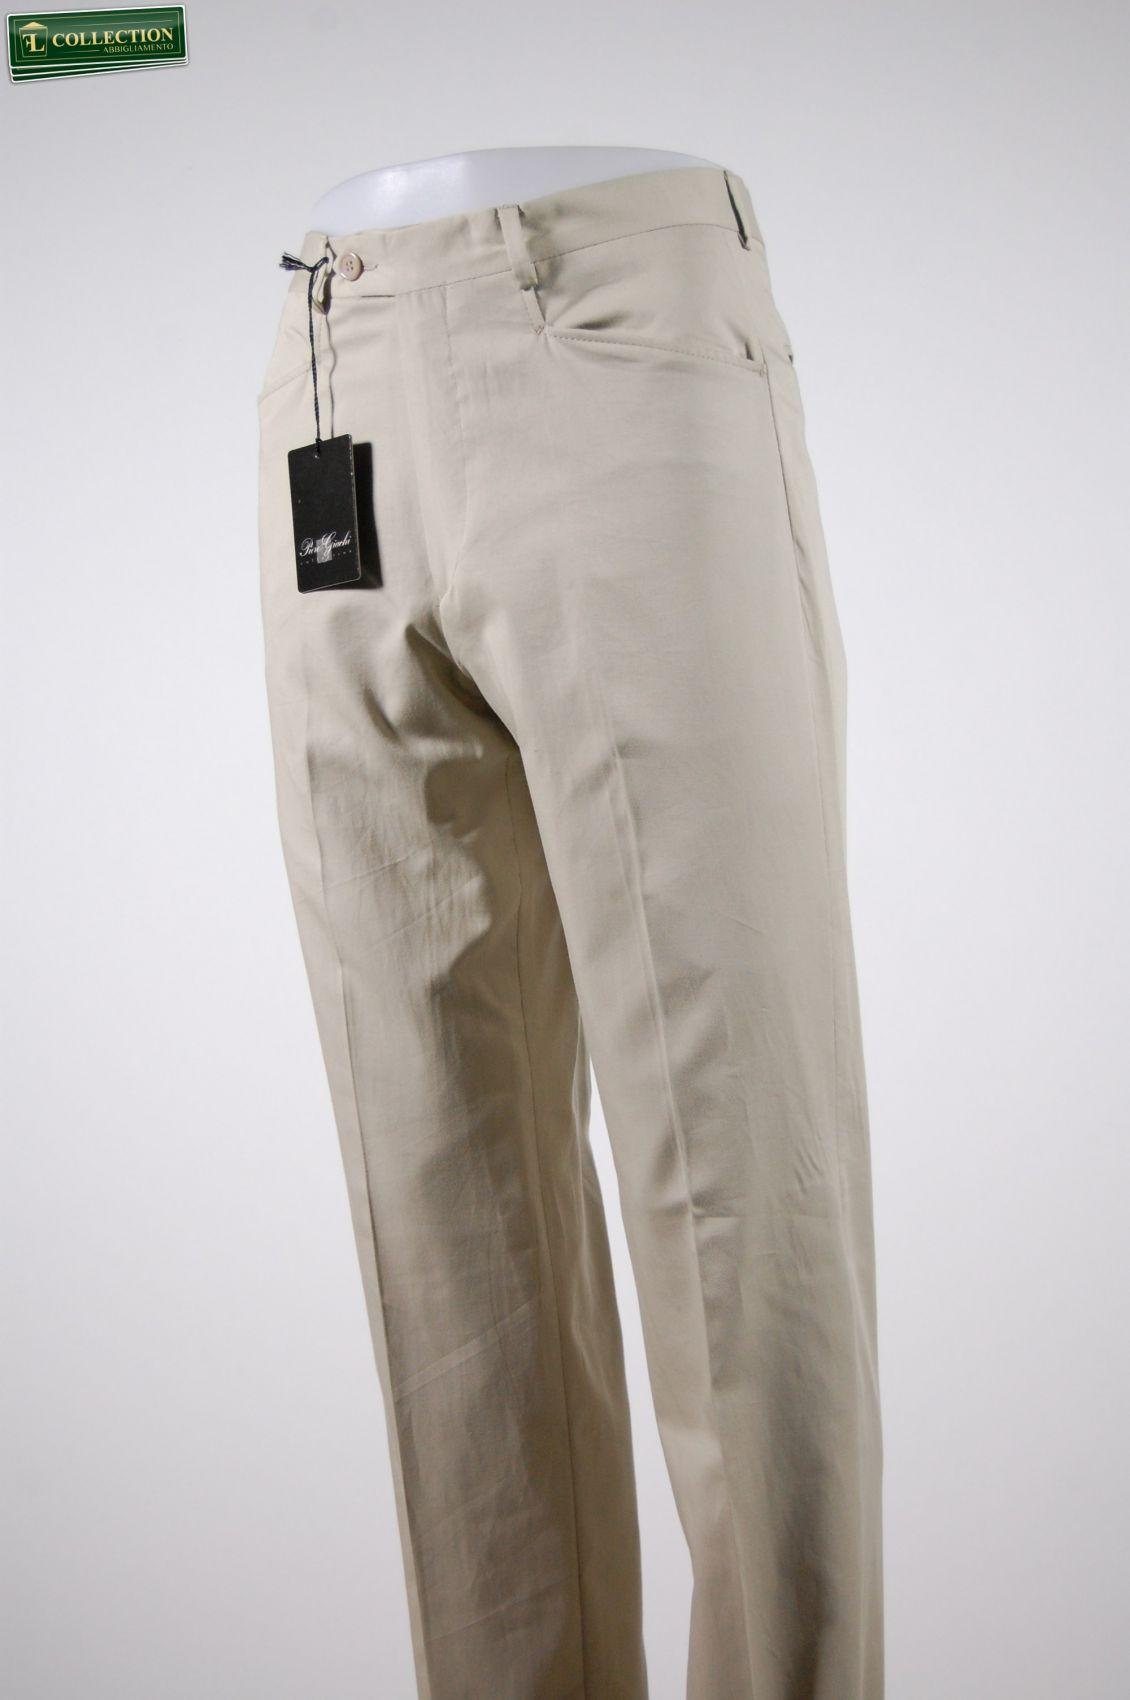 4e9a3d62dc5c 740-f29e30f9-1700-Mens-trousers-style-larusmiani-cotton.jpg